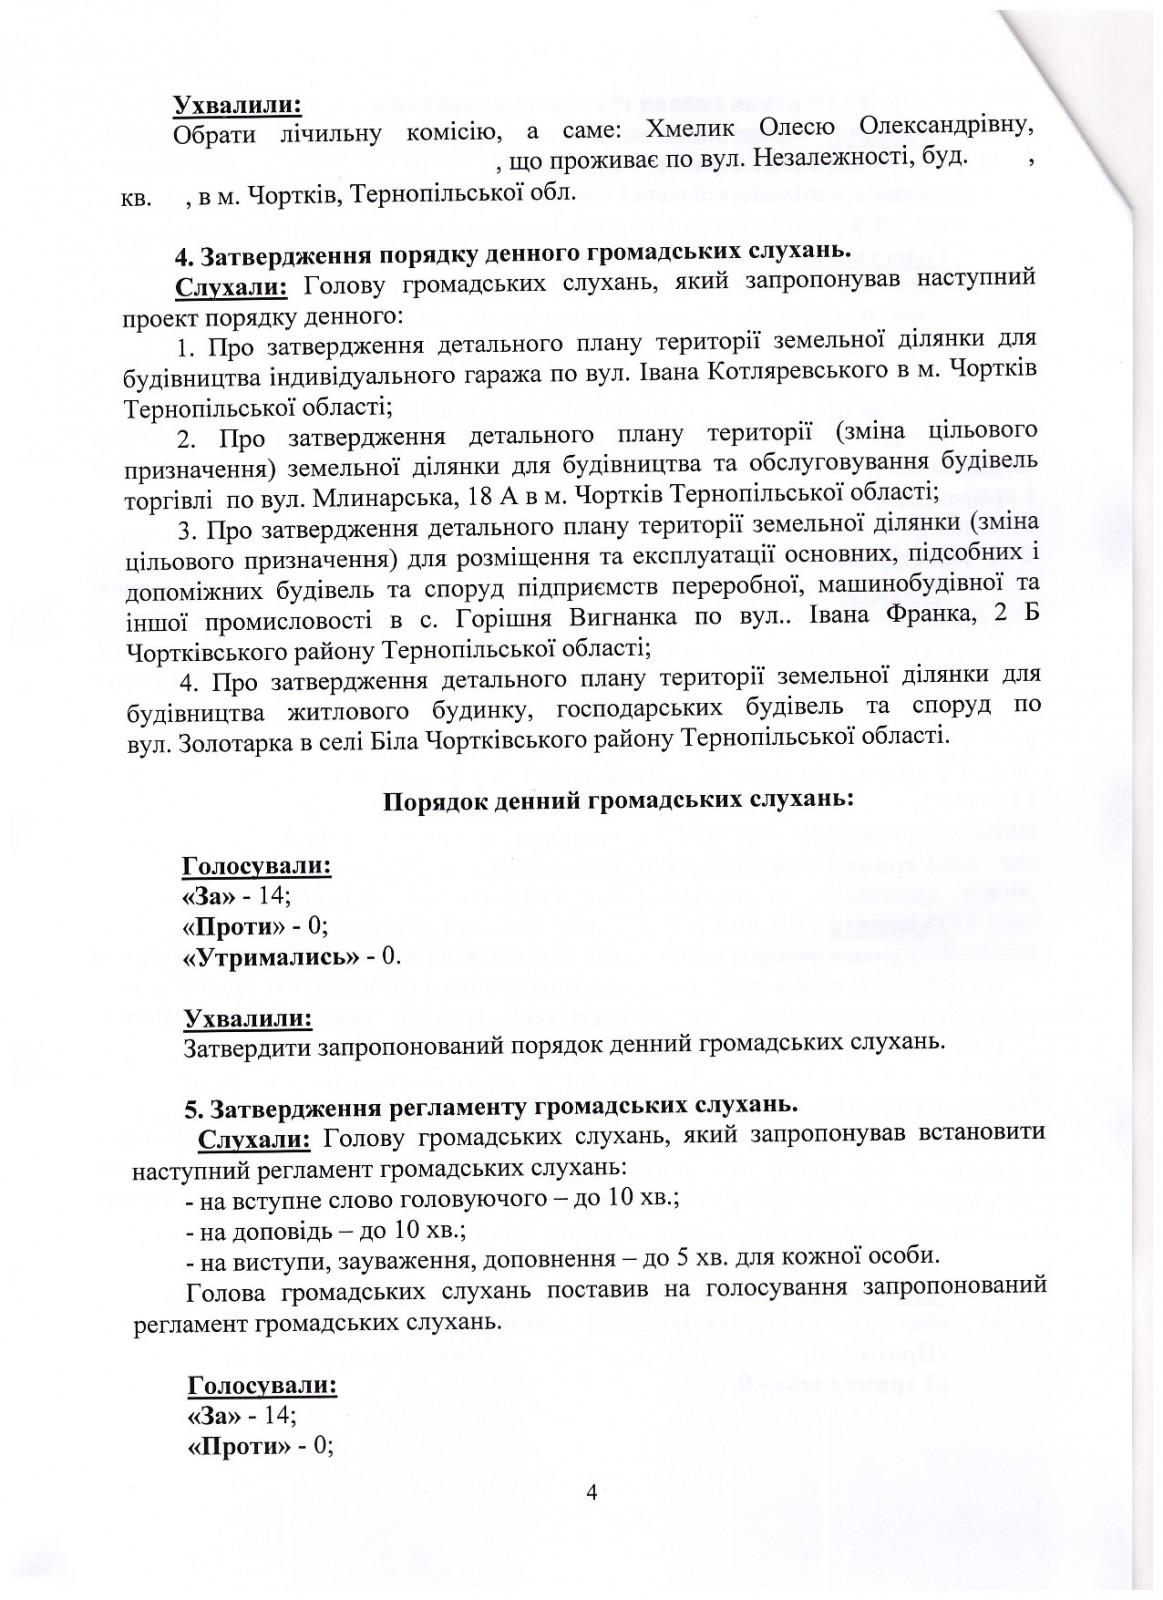 протокол громадських слухань_03-09-2021 (-4